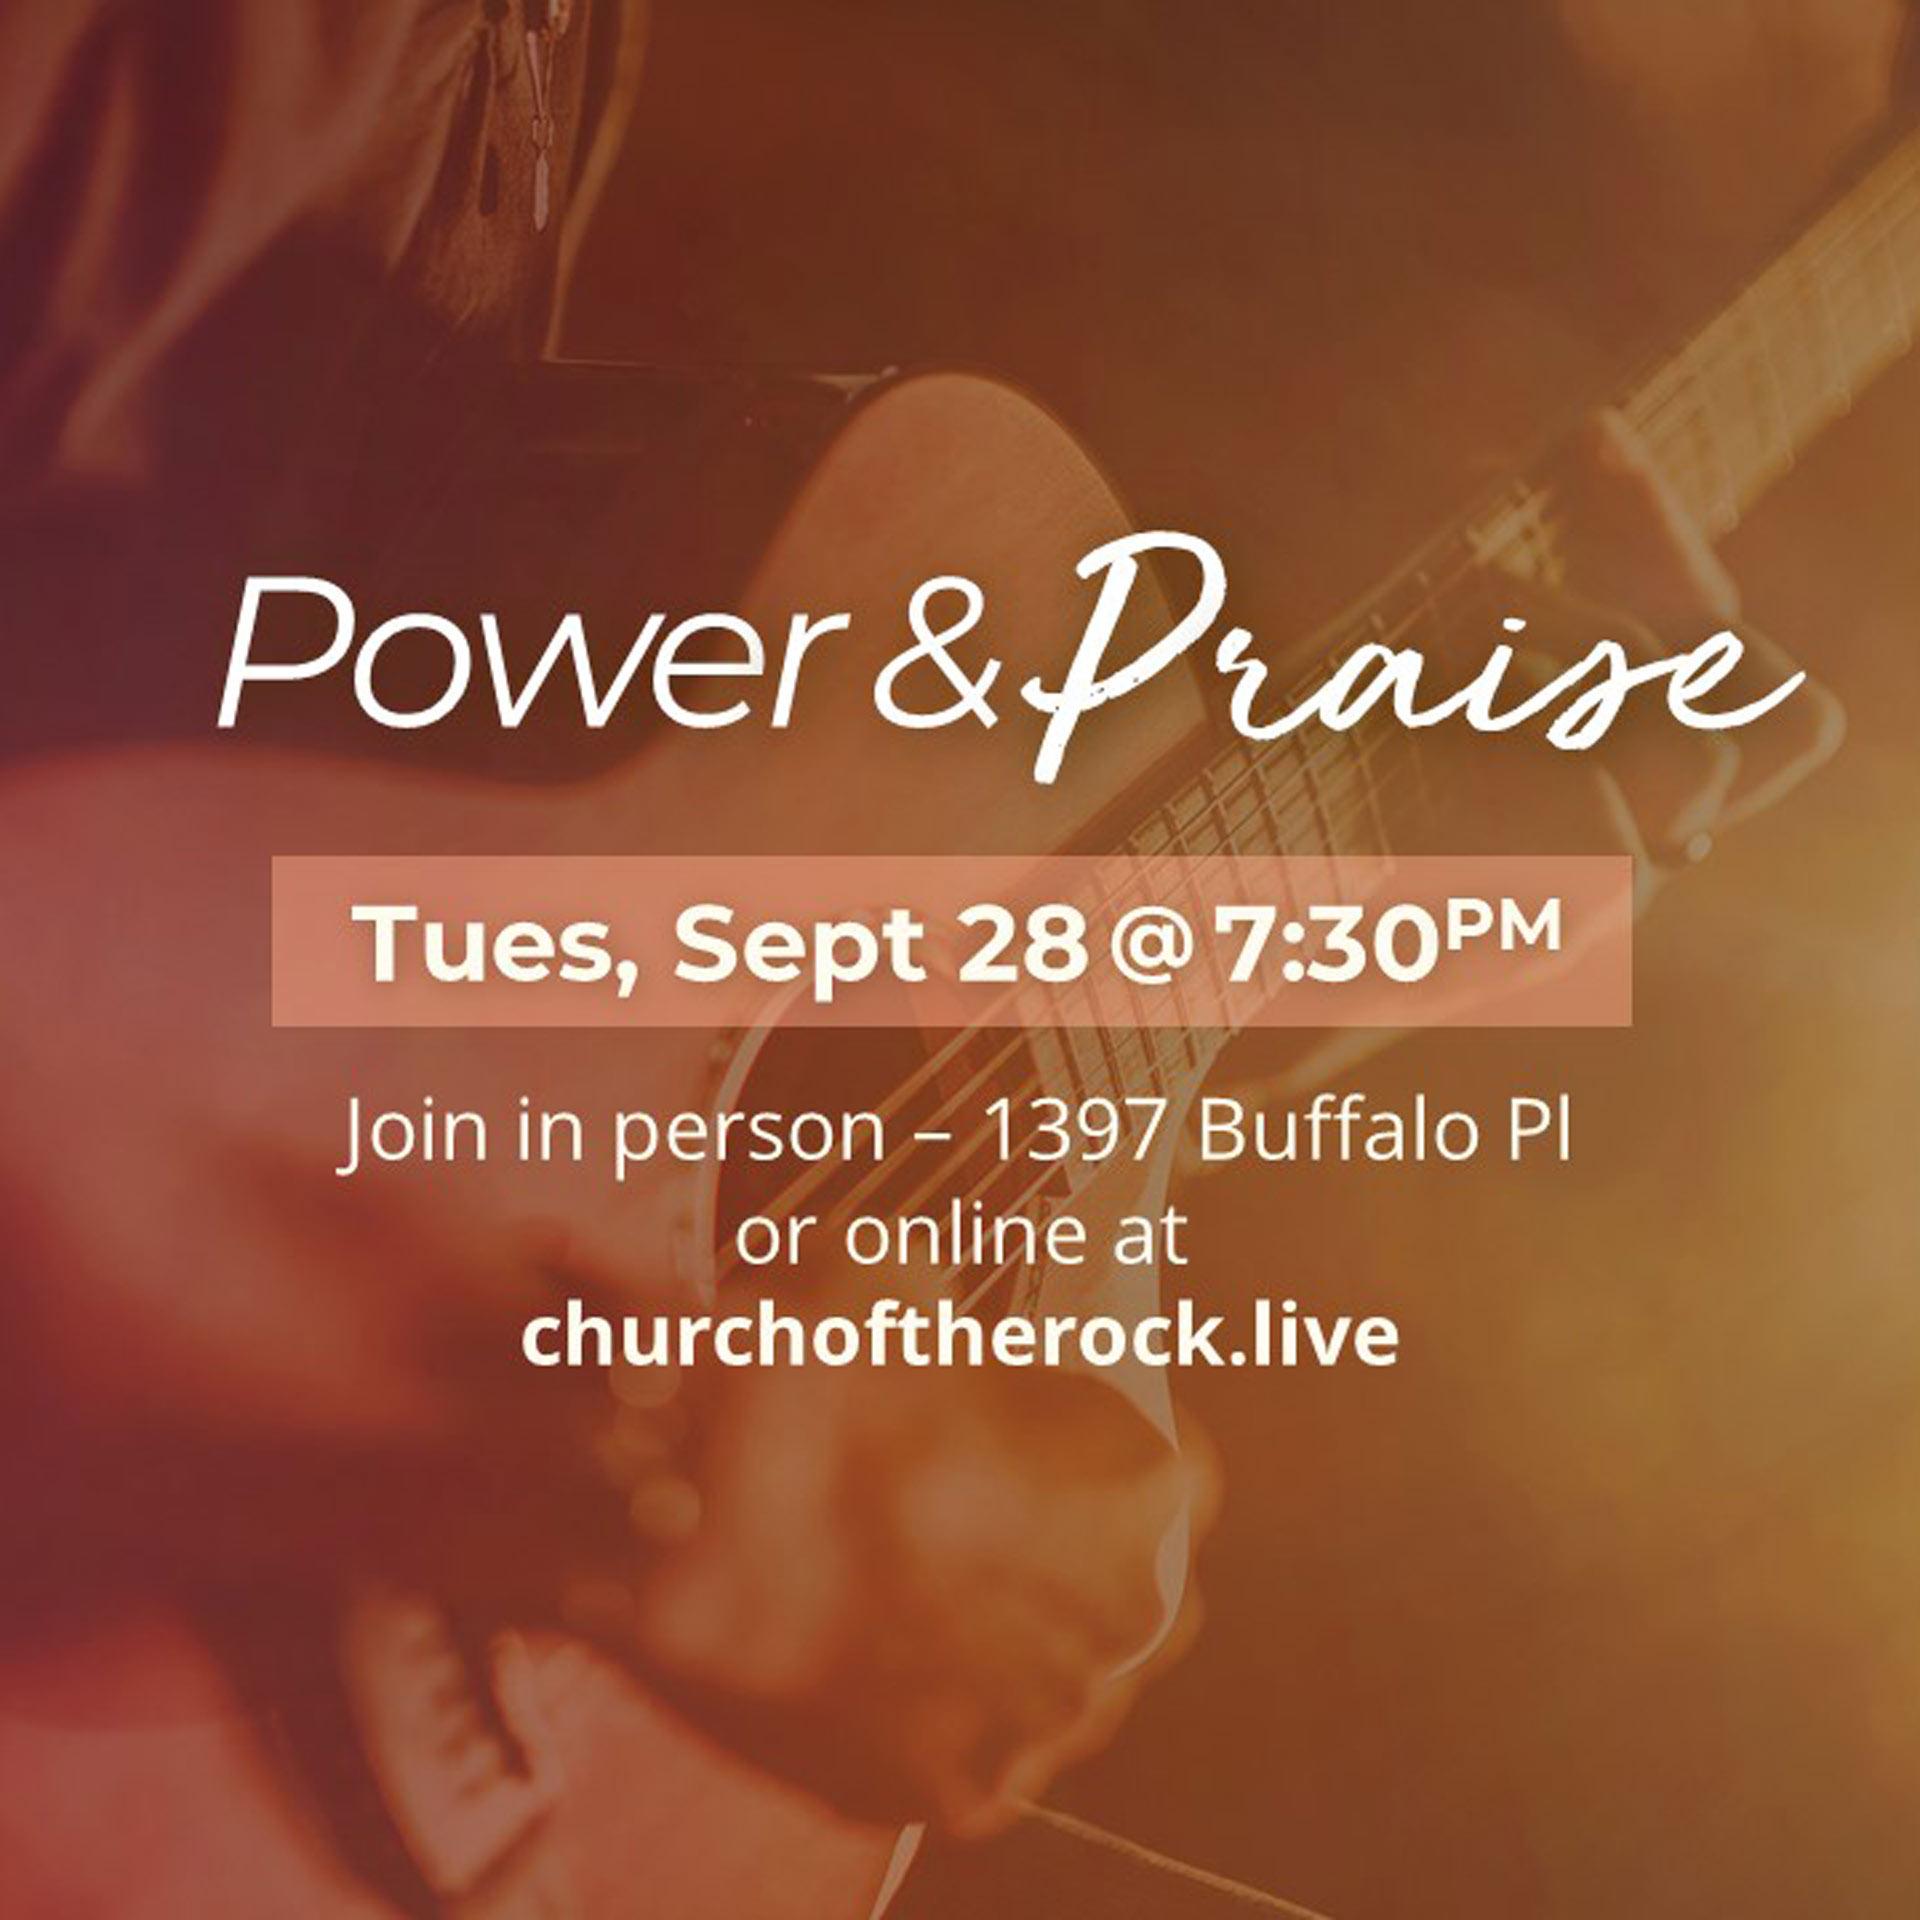 WSC Power & Praise